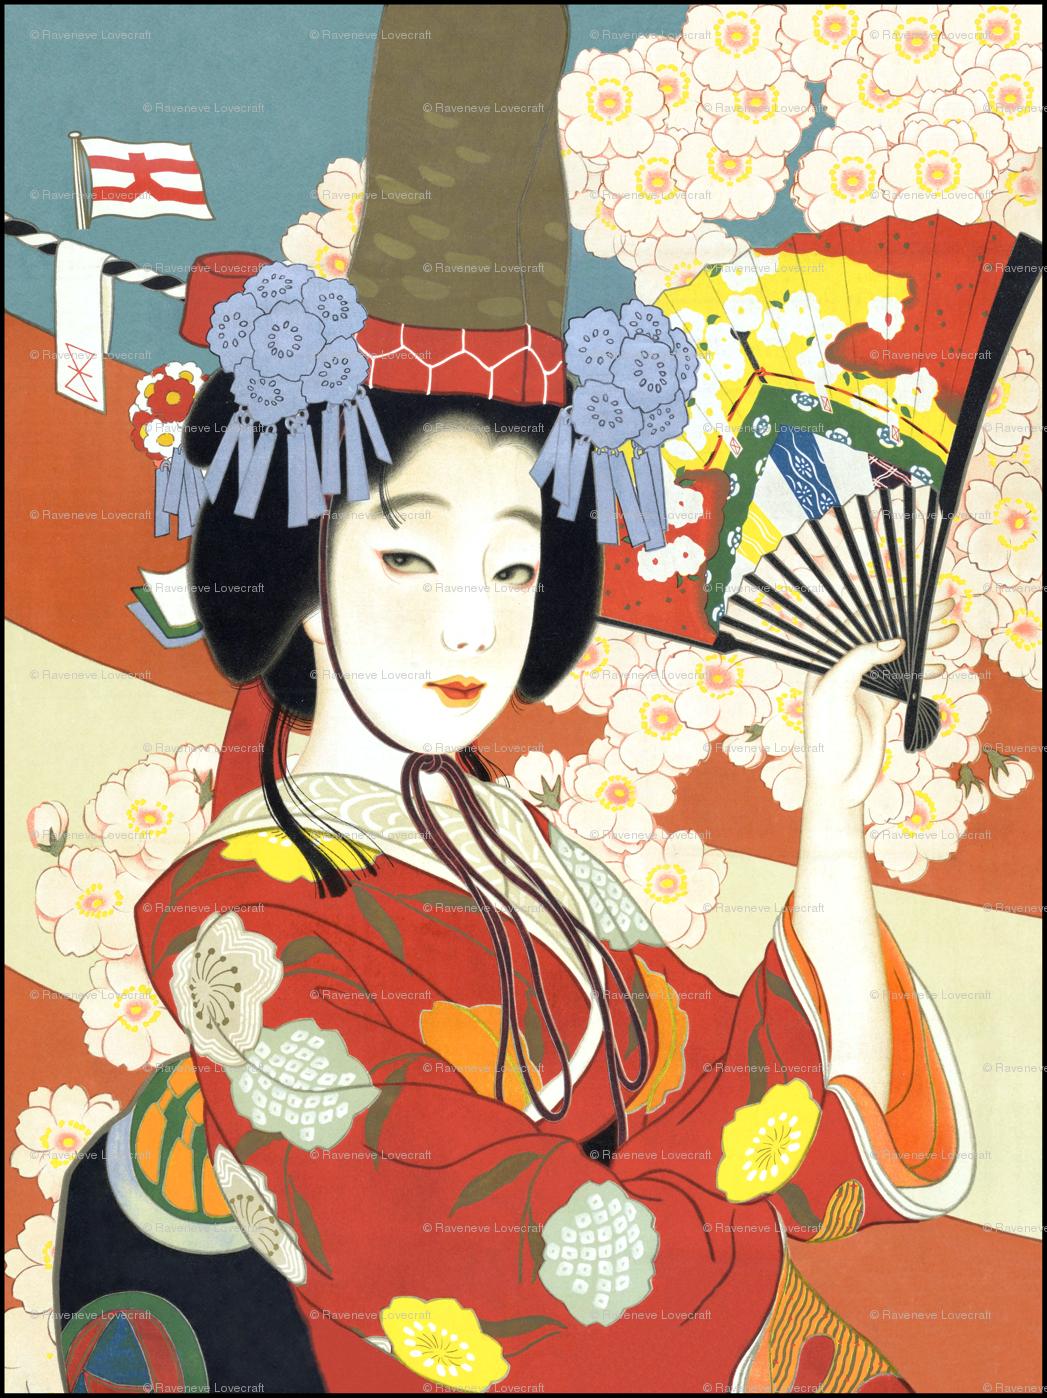 Vintage Japanese Japan Oriental Chinoiserie Culture Kimono Asia Asian Traditional Geisha Maiko Cherry Blossoms Sakura Flowers Fans Fabric